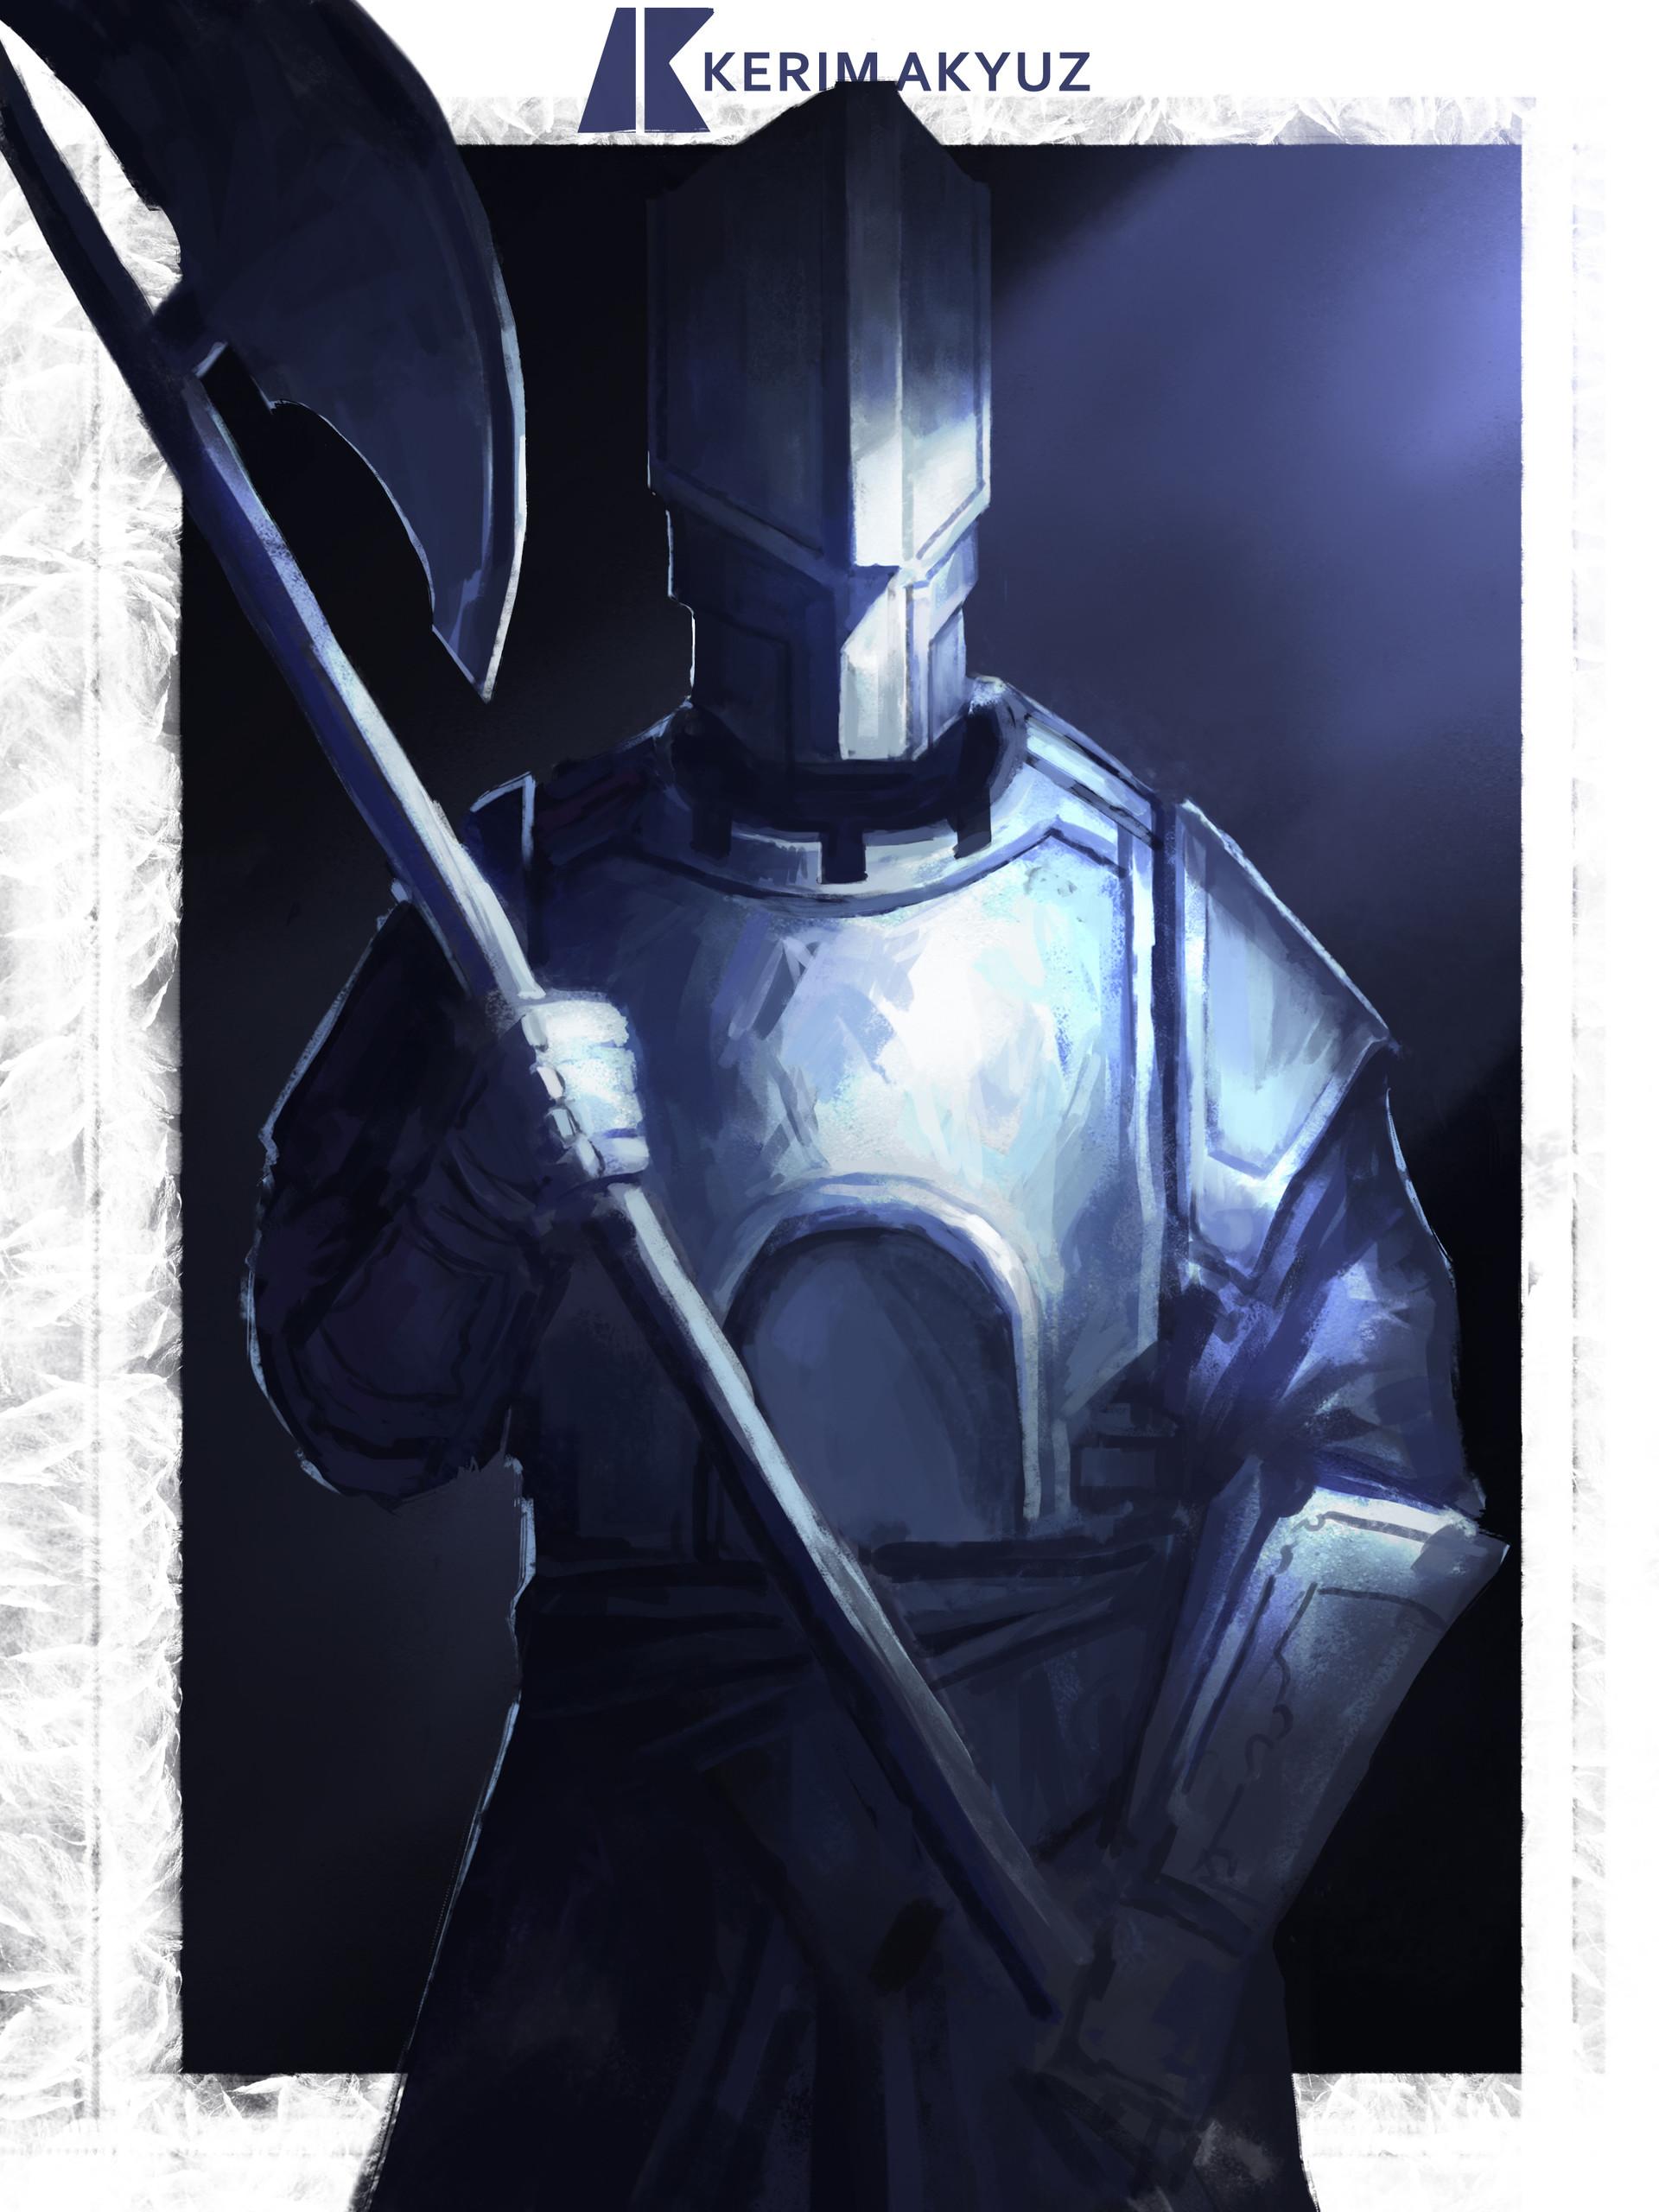 Kerim akyuz 154 royalguard